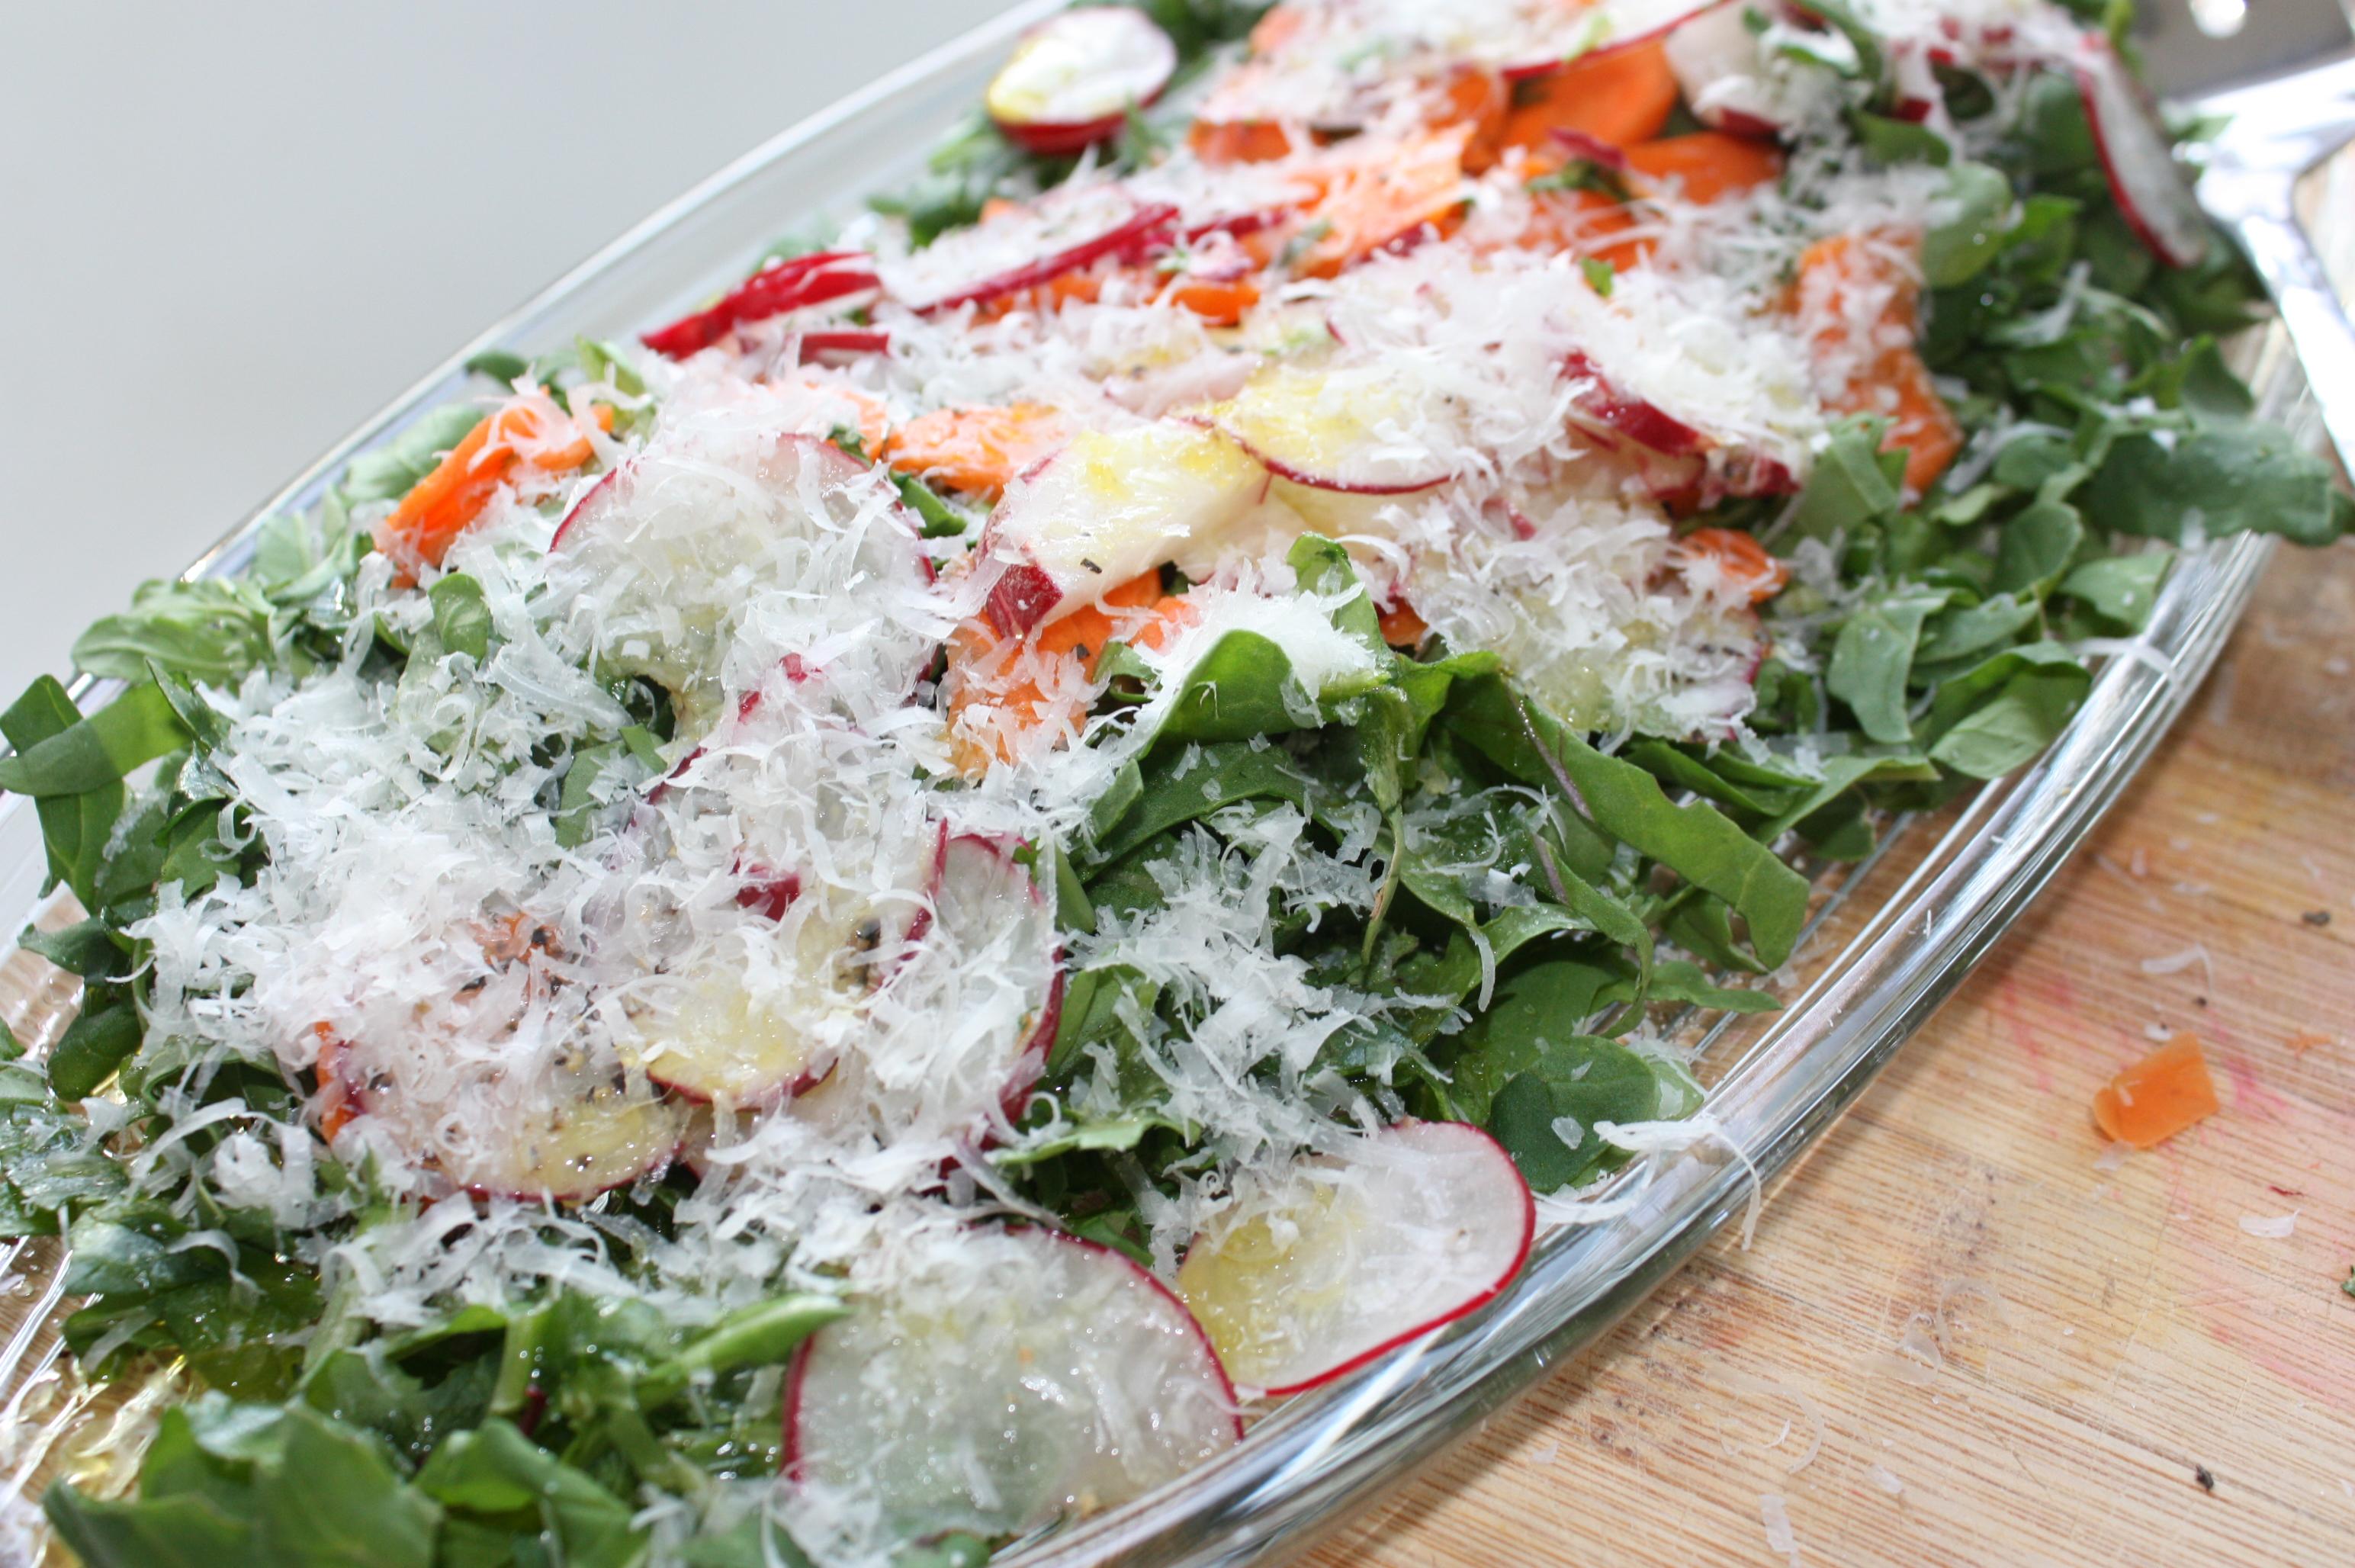 Arugula, Radish & Carrot Salad